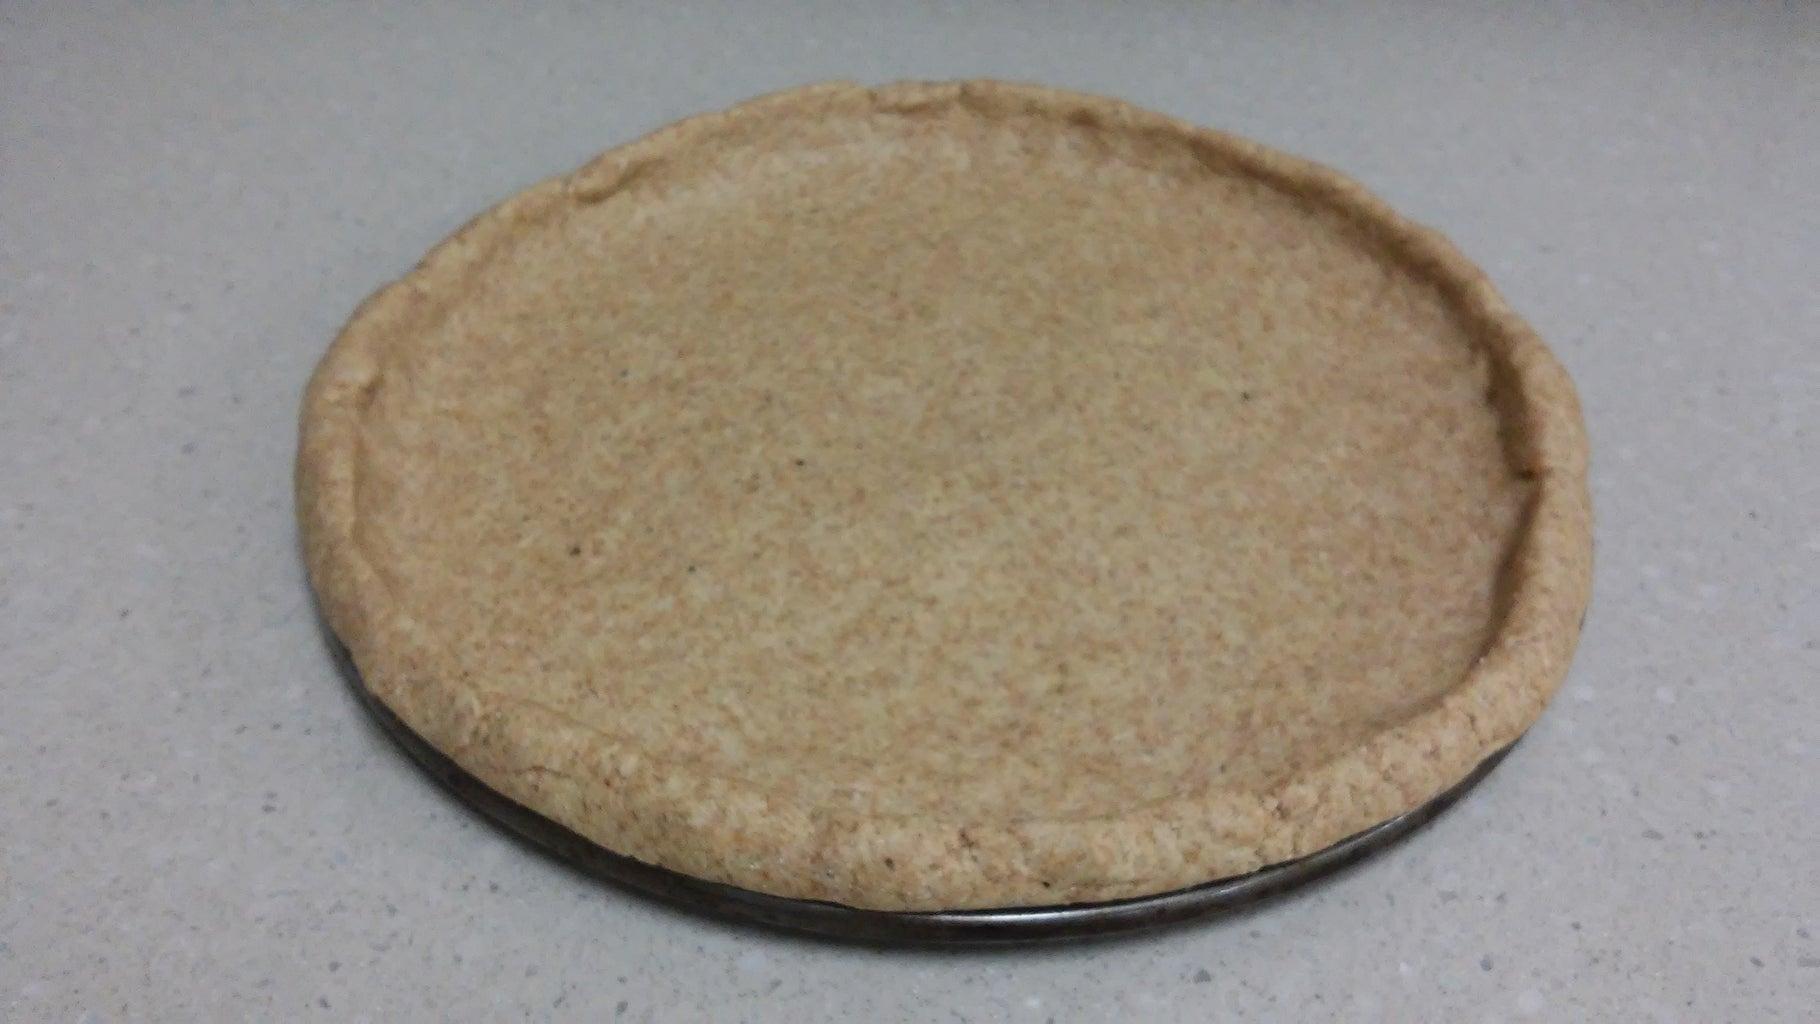 Making Crust